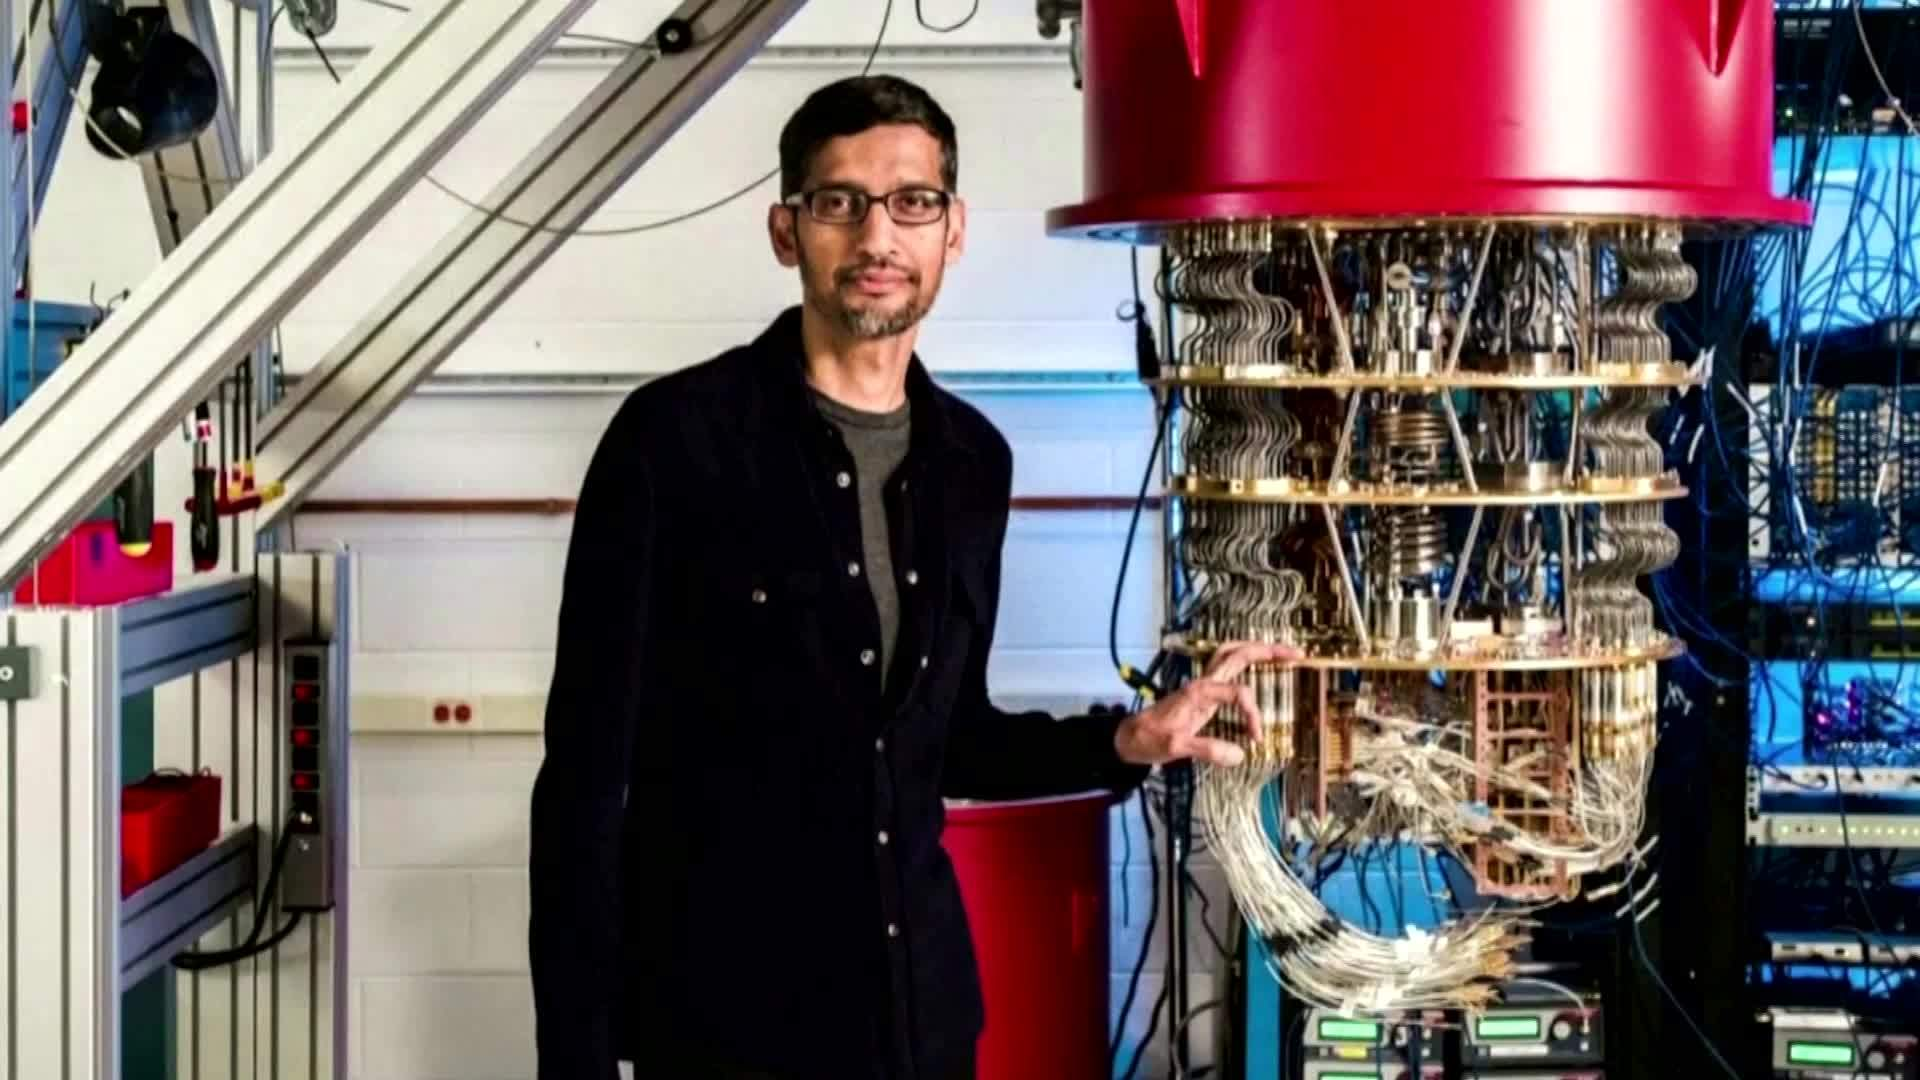 Google co-founders step aside; Pichai to helm Alphabet